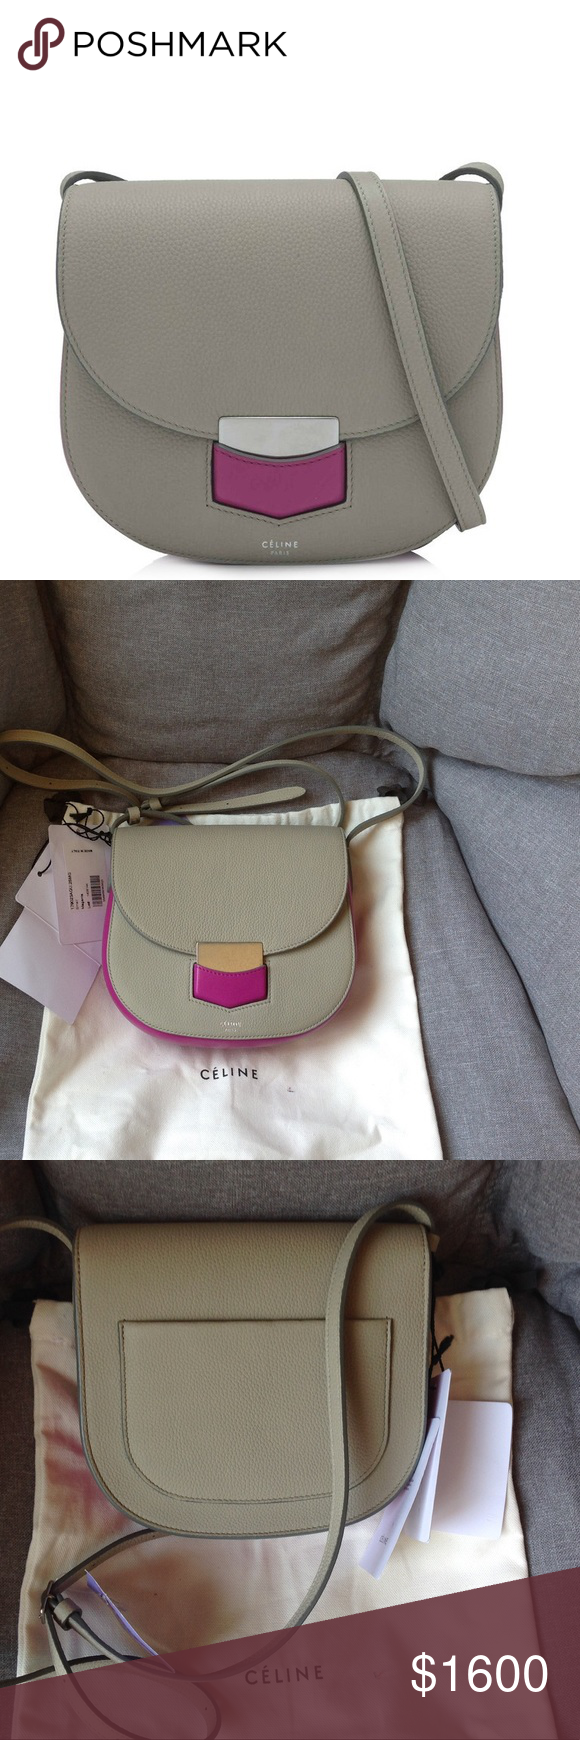 39ac9661c Celine trotteur small shoulder bag Céline Small Trotteur Bag (Grey, Pink; Calfskin  Leather